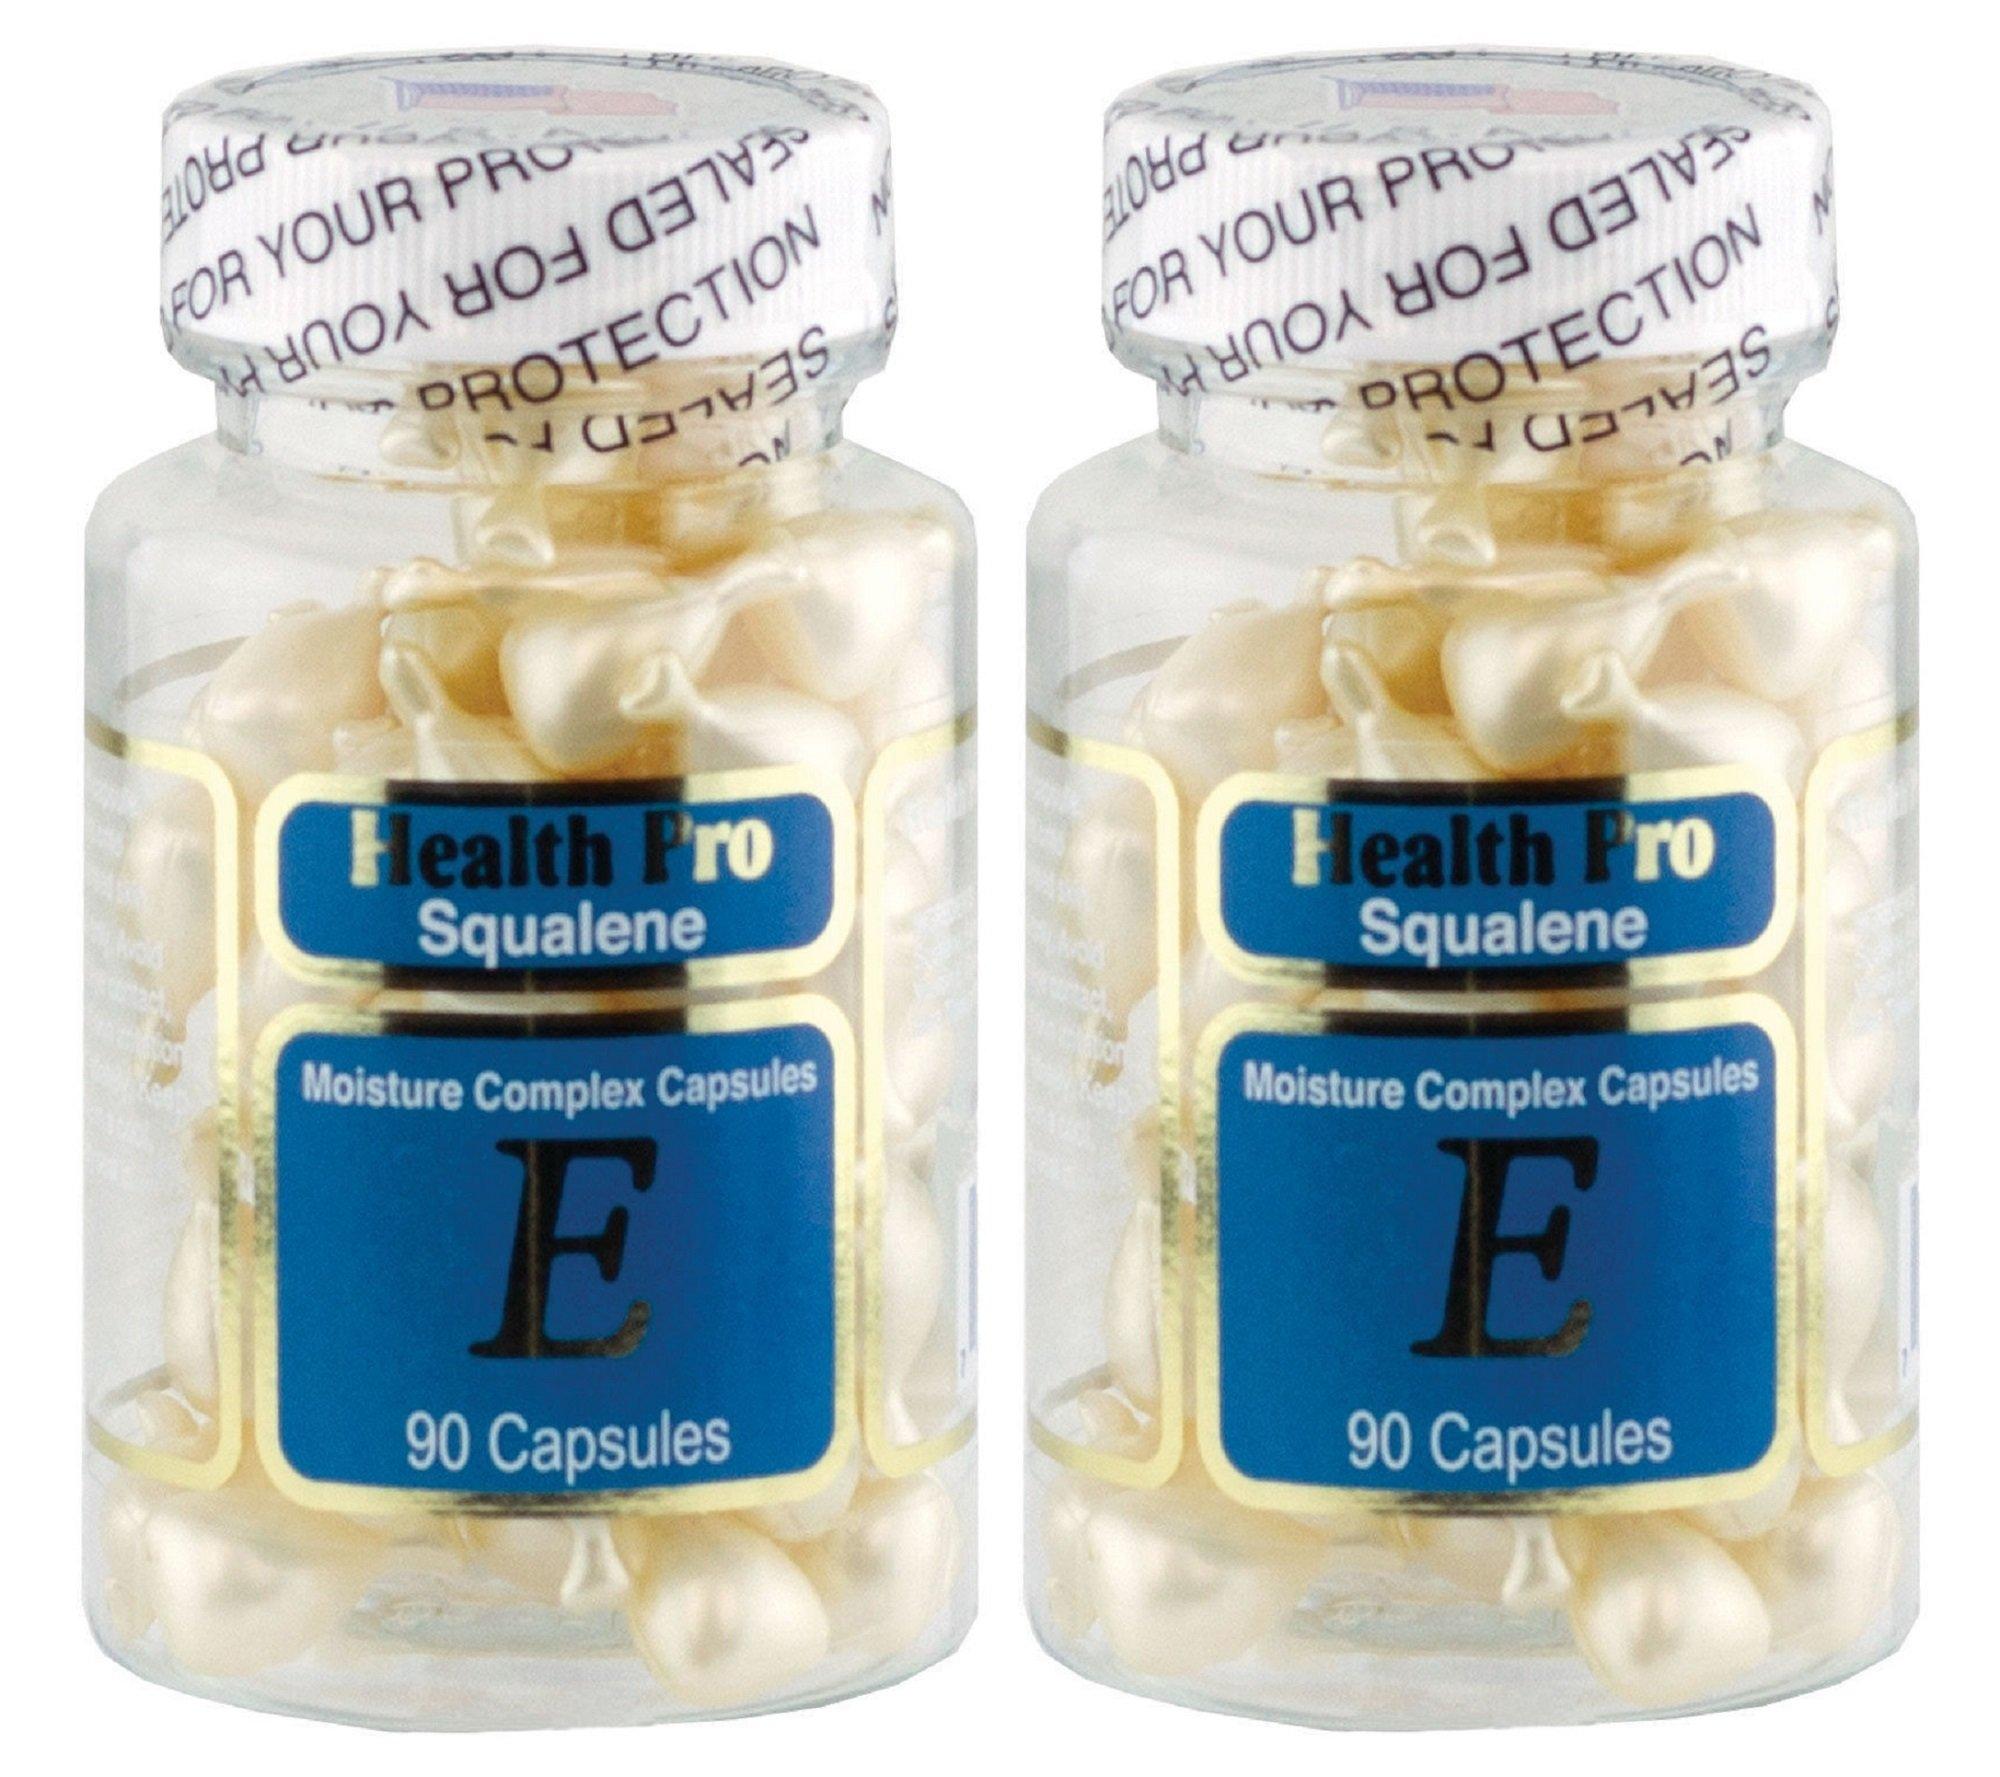 2 packs Squalene Moisture Complex (90 Capsules)